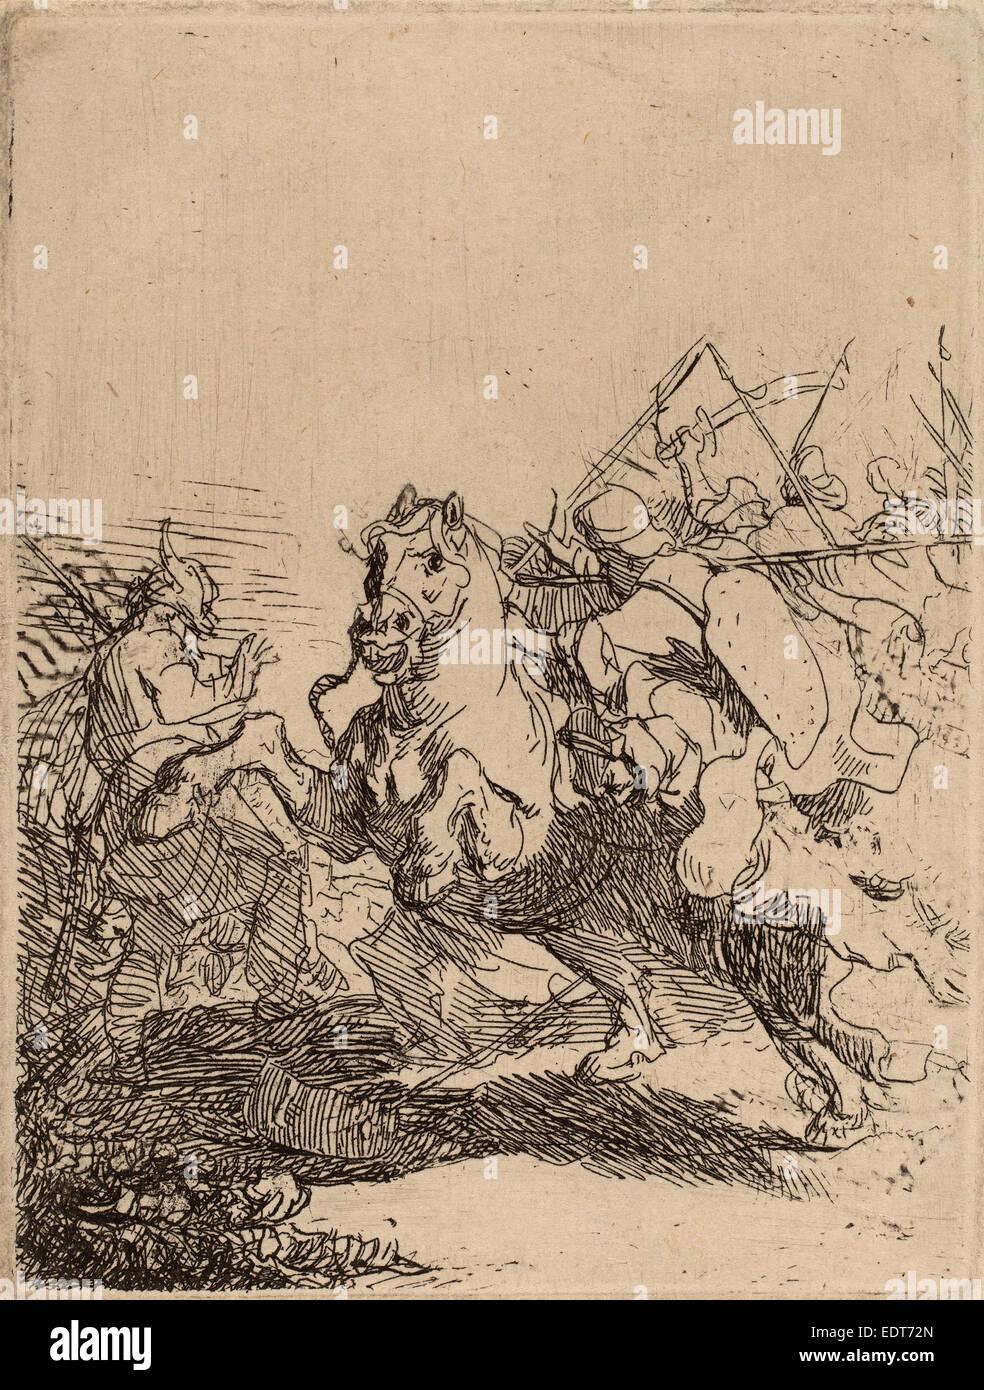 Rembrandt van Rijn (Dutch, 1606 - 1669), A Cavalry Fight, c. 1632, etching - Stock Image